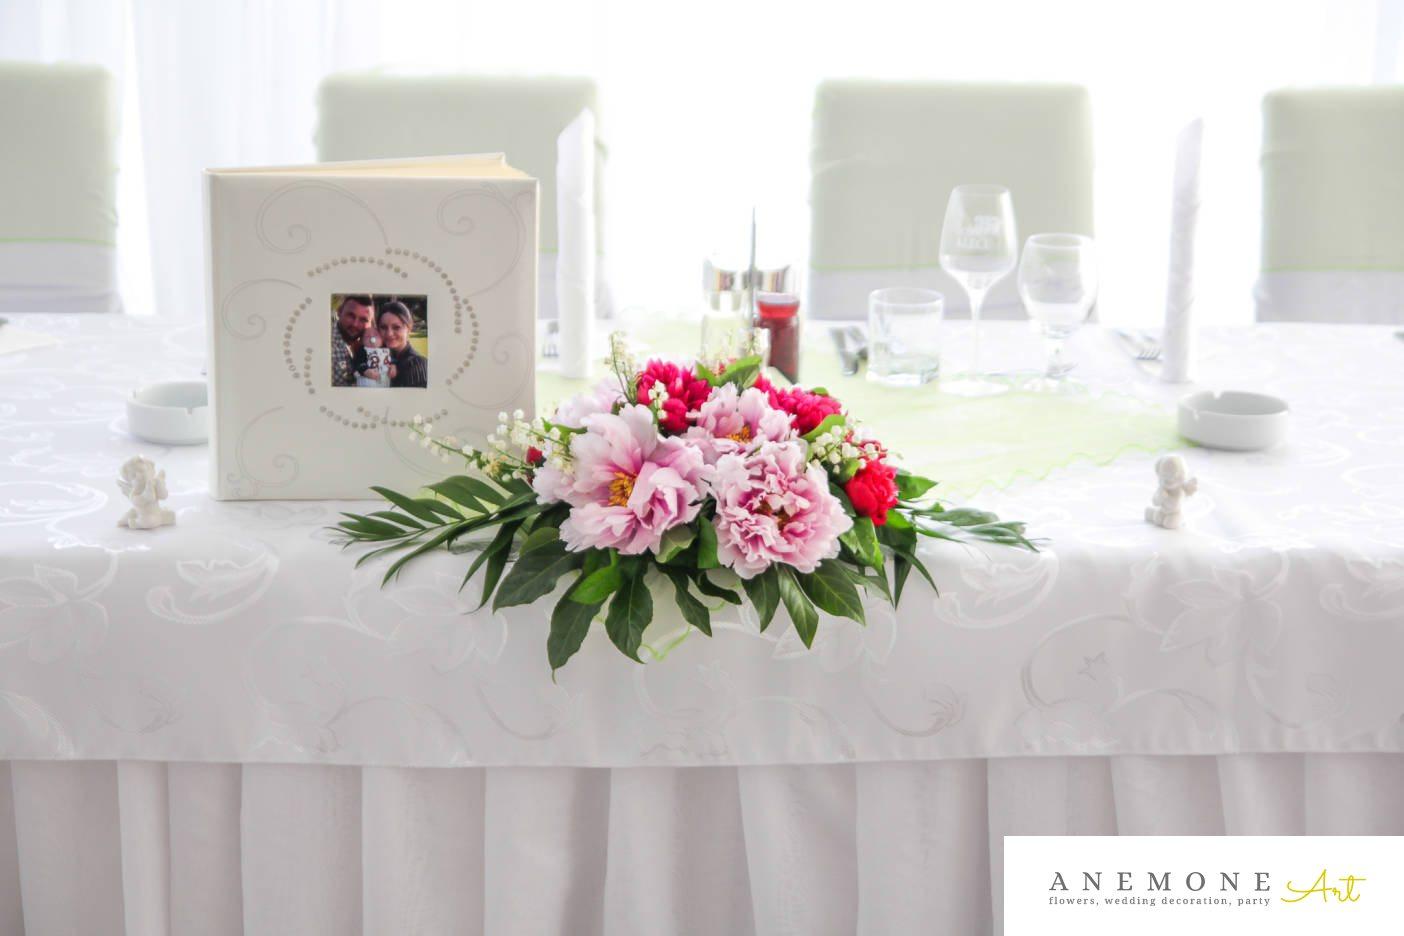 Poza, foto cu Flori de nunta bujori, decor masa, lacramioare, lumanare, roz, trandafiri in Arad, Timisoara, Oradea (wedding flowers, bouquets) nunta Arad, Timisoara, Oradea